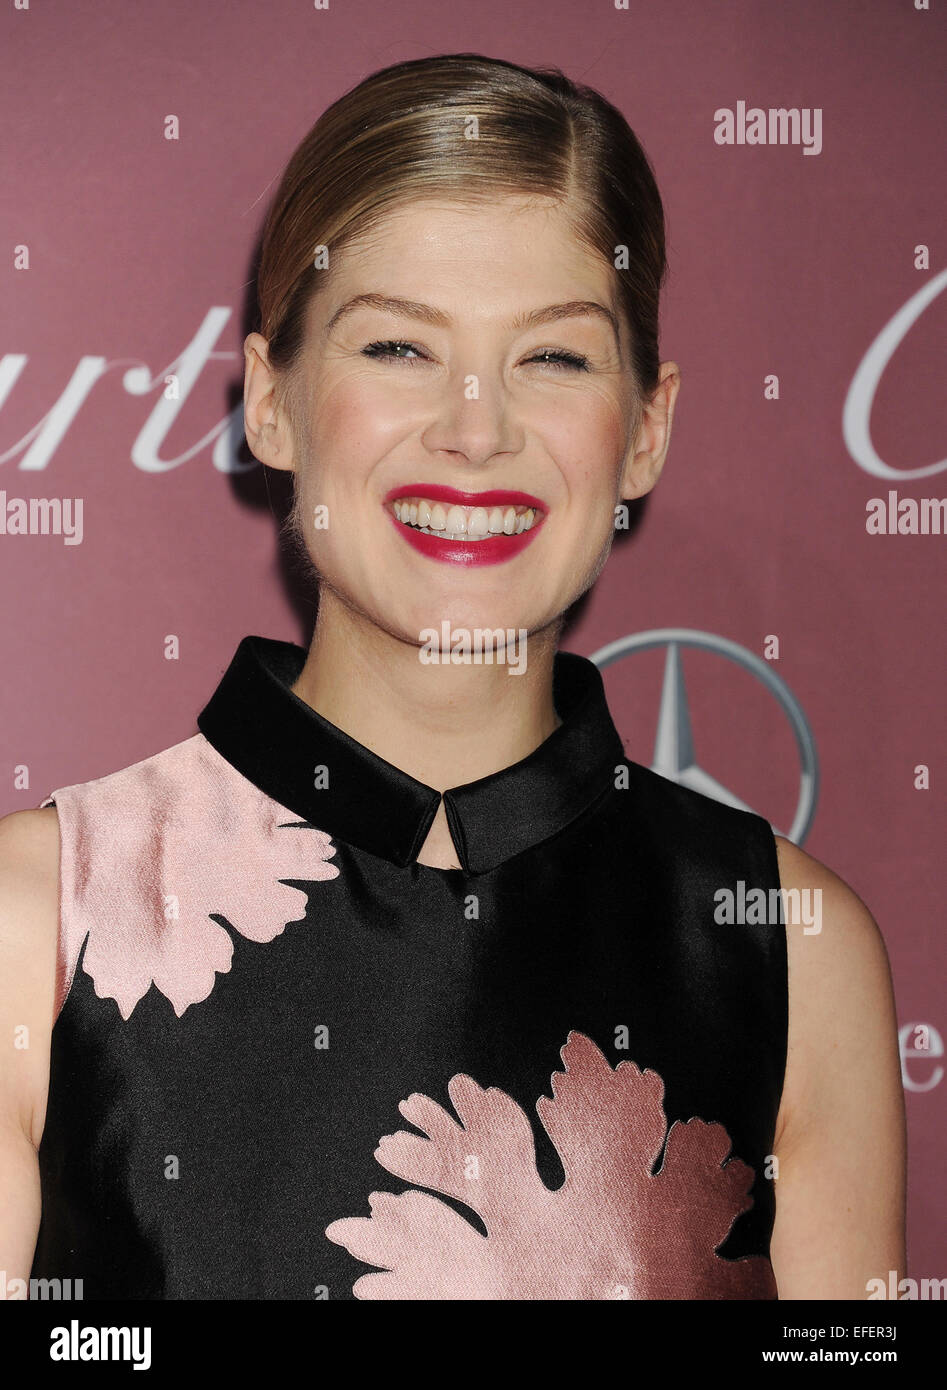 ROSAMUND PIKE  UK film actress in January 2015.Photo Jeffrey Mayer - Stock Image